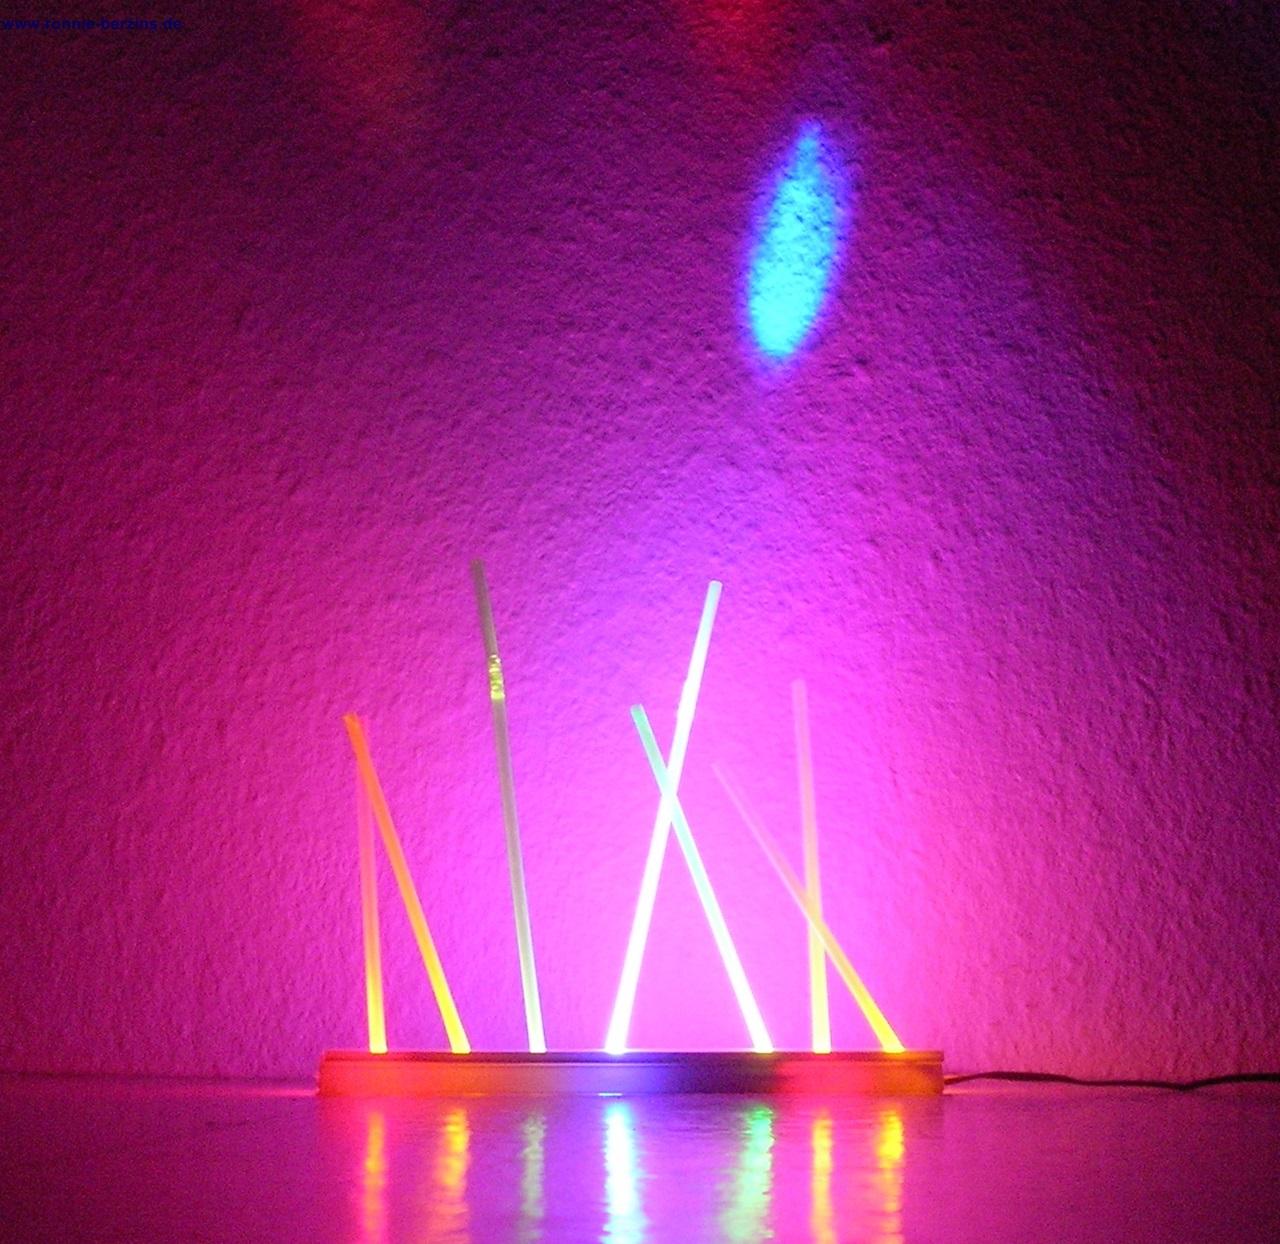 kreative kiste kreative party beleuchtung selber bauen. Black Bedroom Furniture Sets. Home Design Ideas